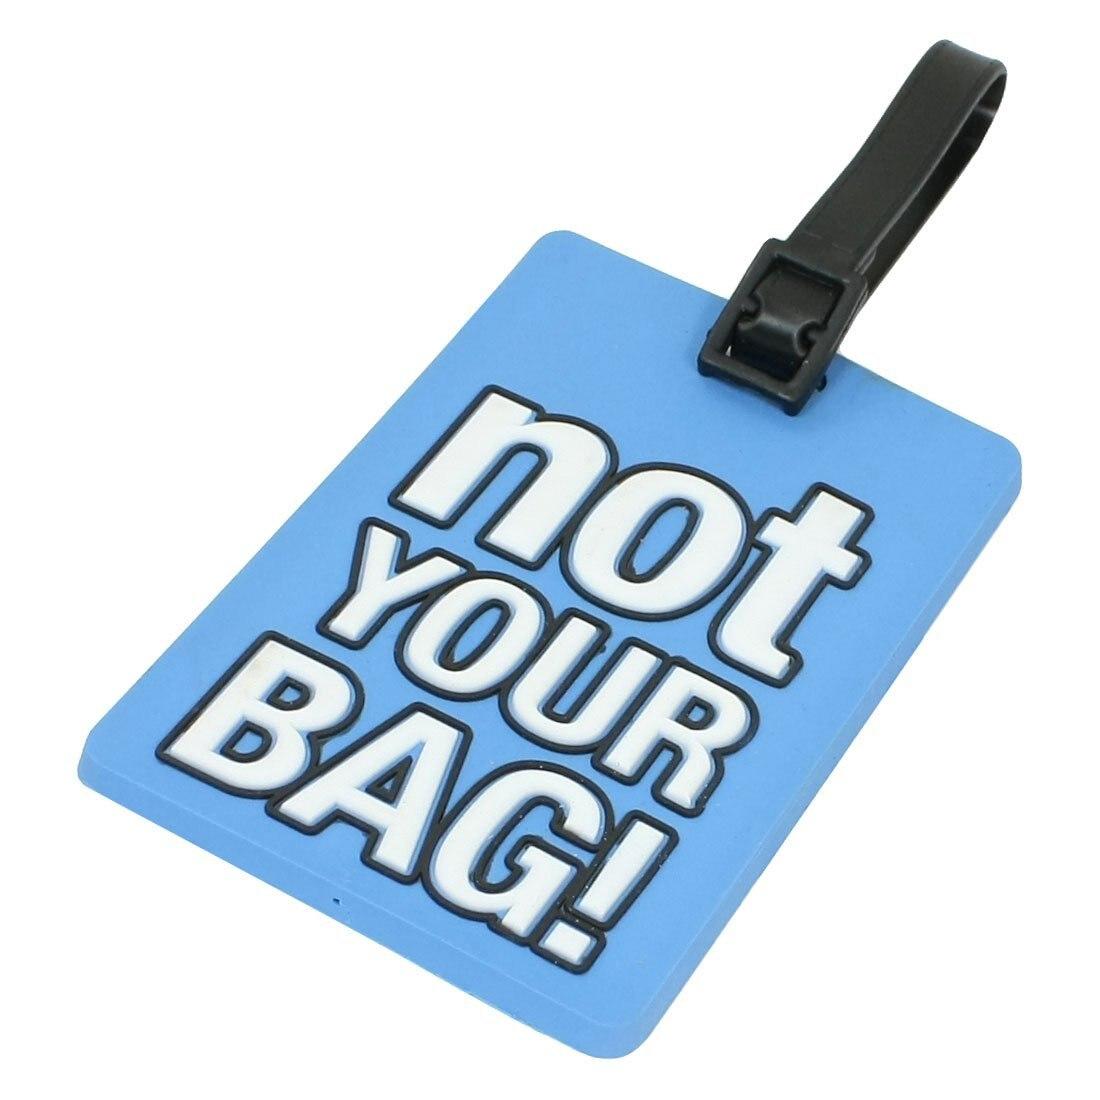 5 Pcs of (VSEN Name Address Label Blue Soft Plastic Not Your Bag Pattern Luggage Tag)